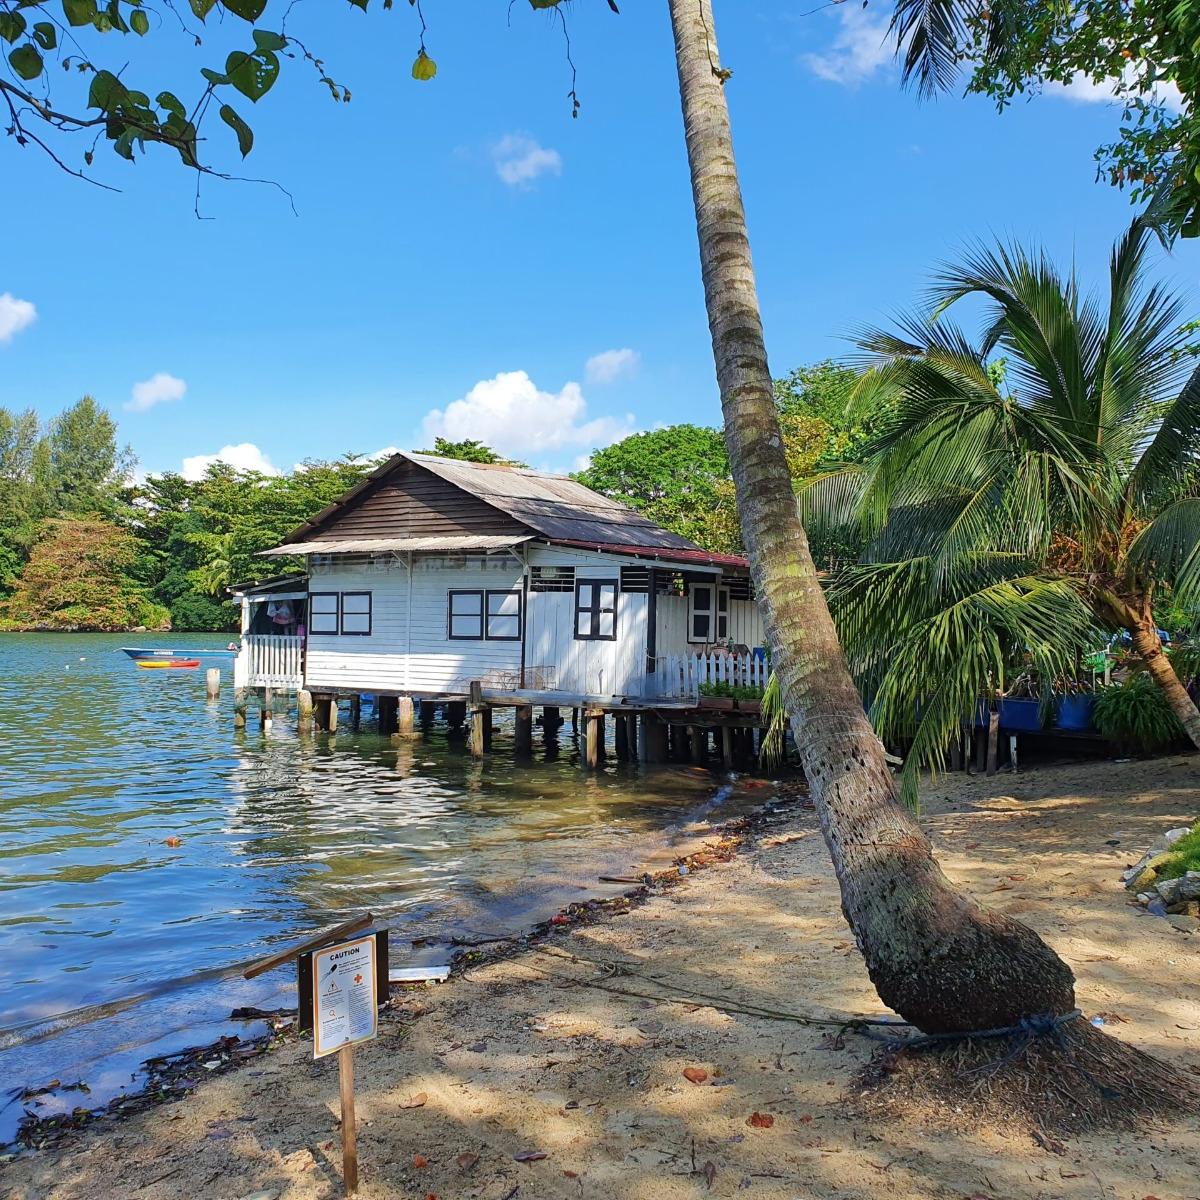 Explore Chek Jawa @ Pulau Ubin